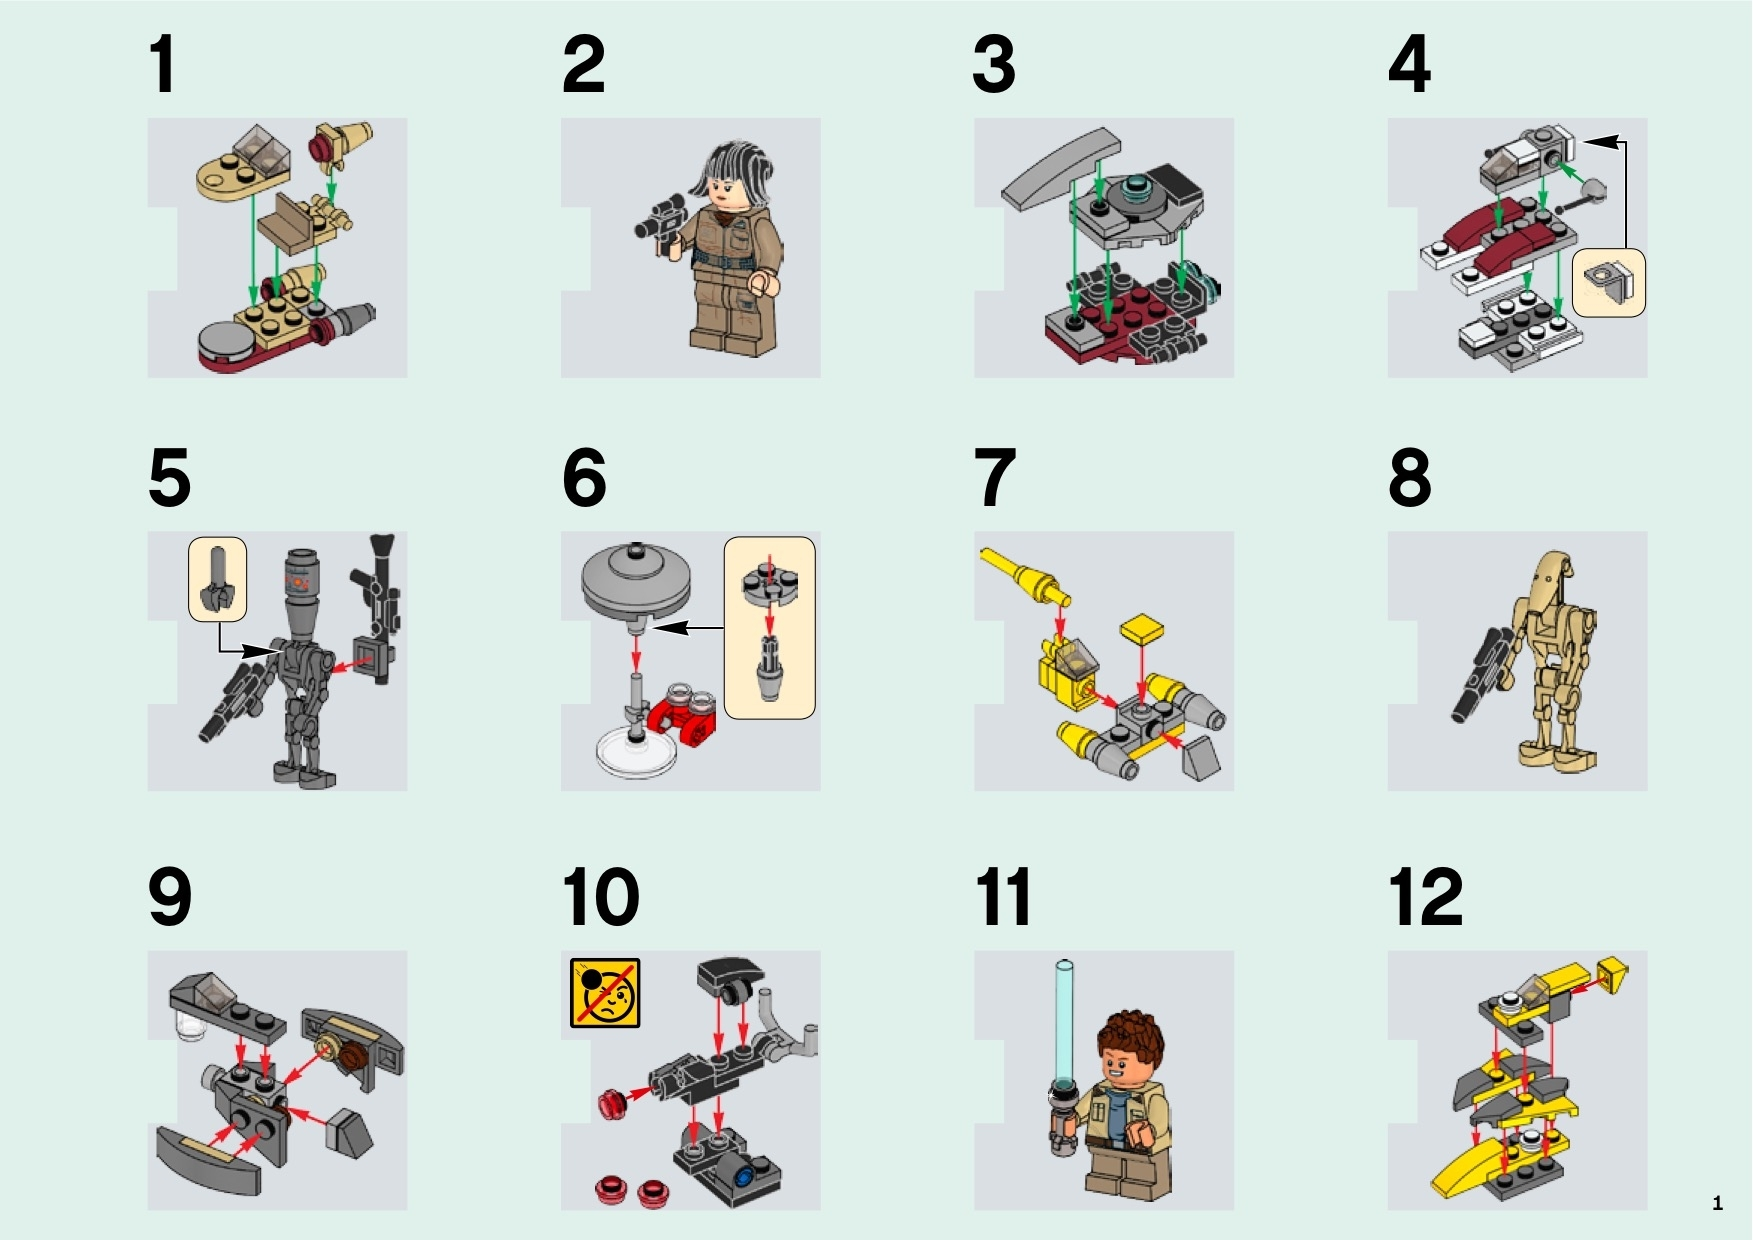 Lego 75213 Star Wars Advent Calendar Instructions, Star Wars inside Lego Advent Calendar Star Wars Directions